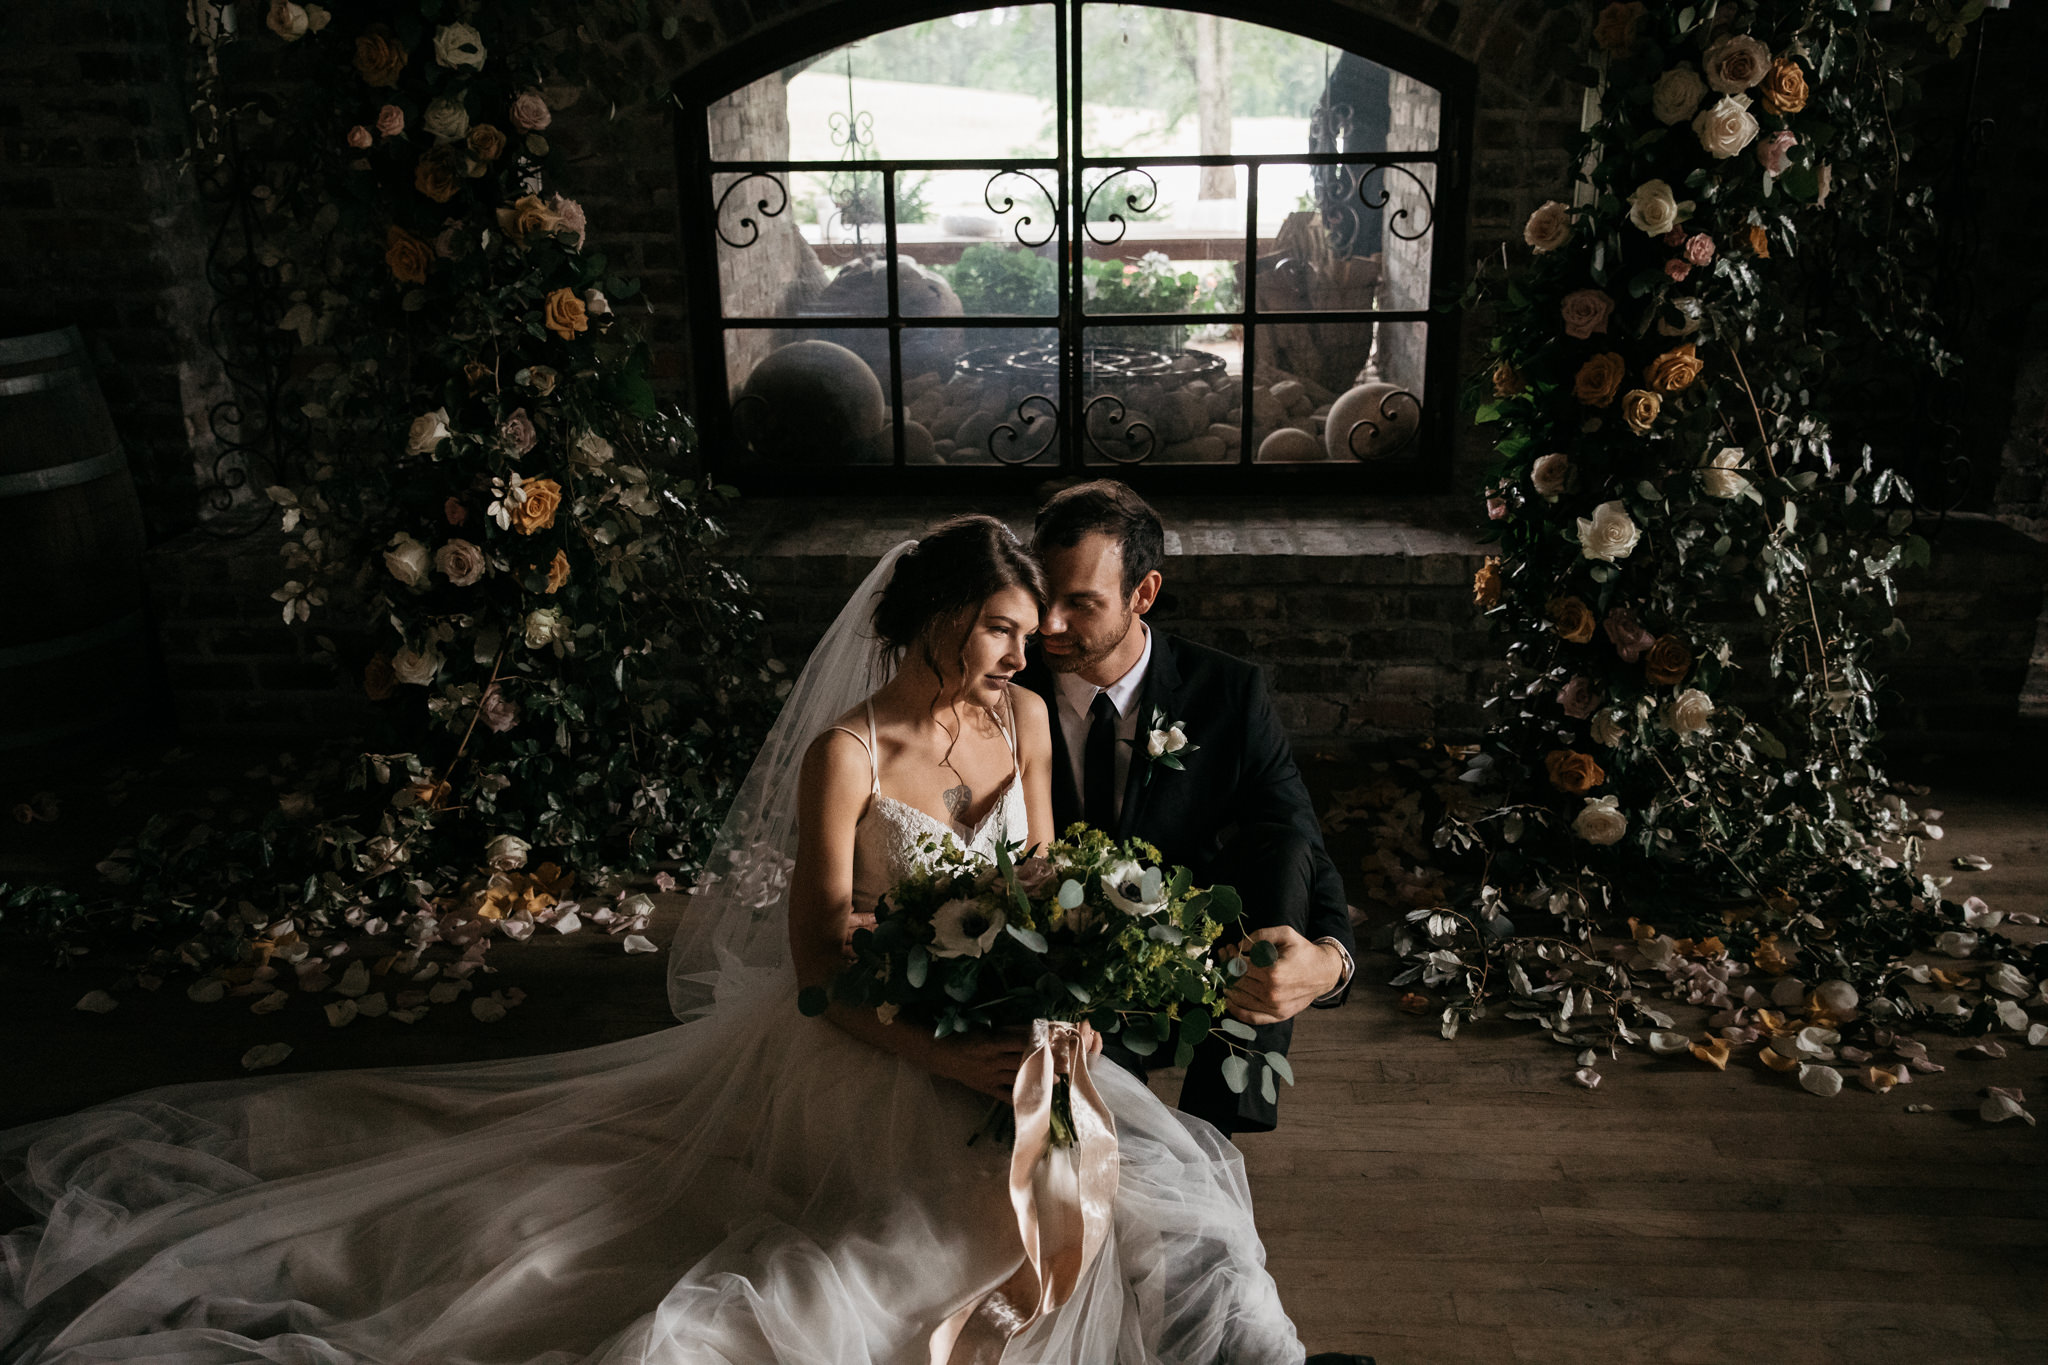 phantom-canyon-brewery-colorado-springs-wedding-photographer-292.jpg